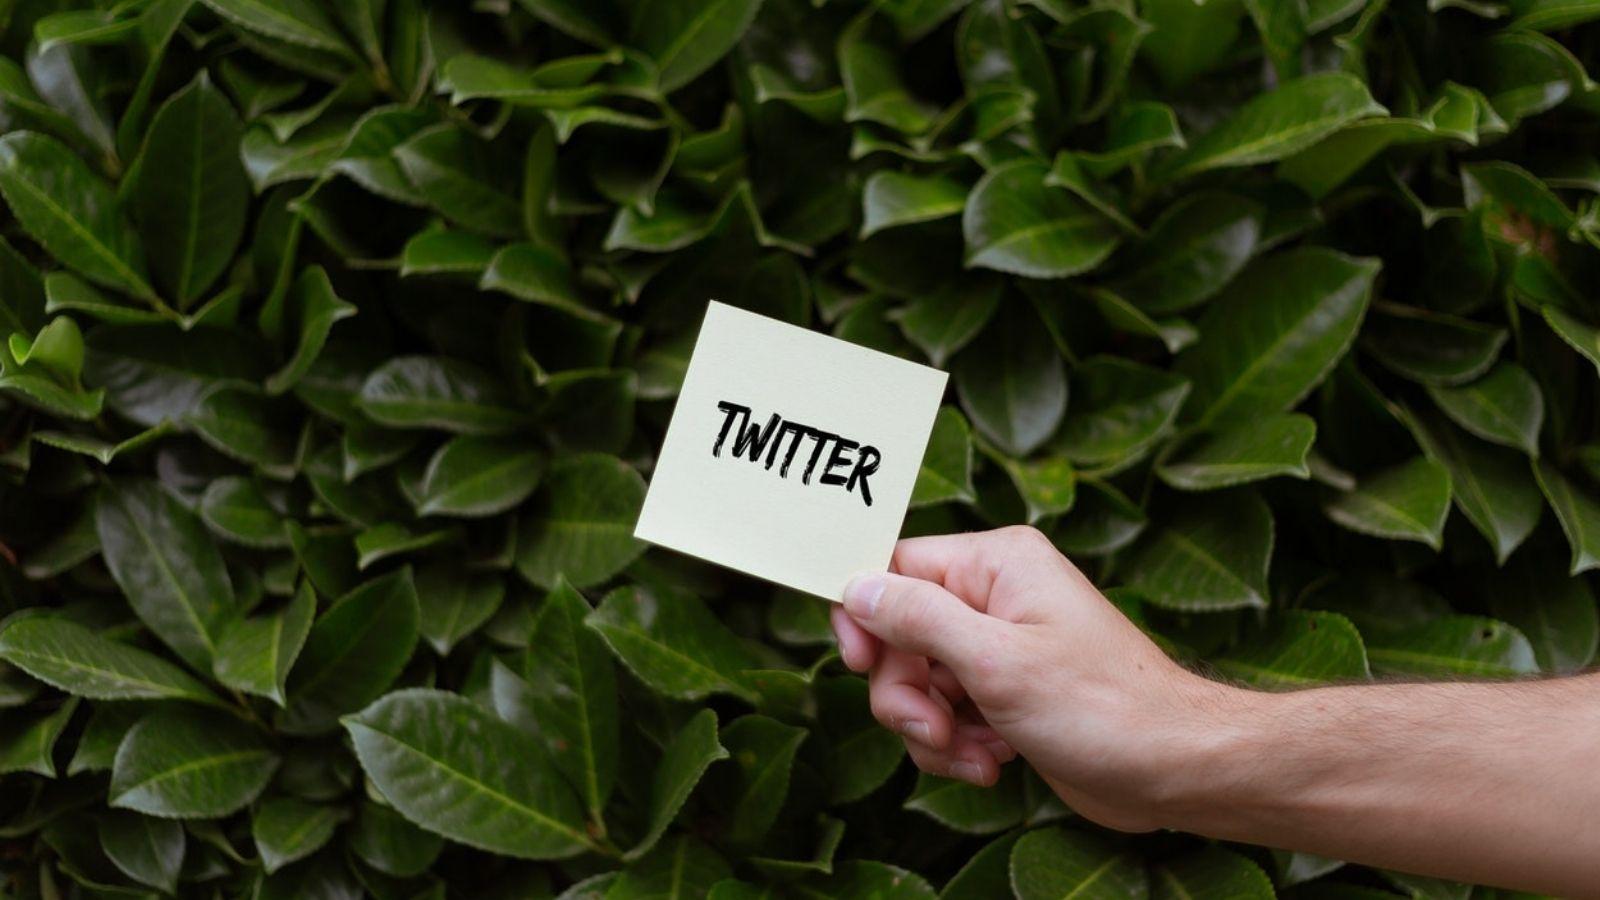 Twitter Paper Text